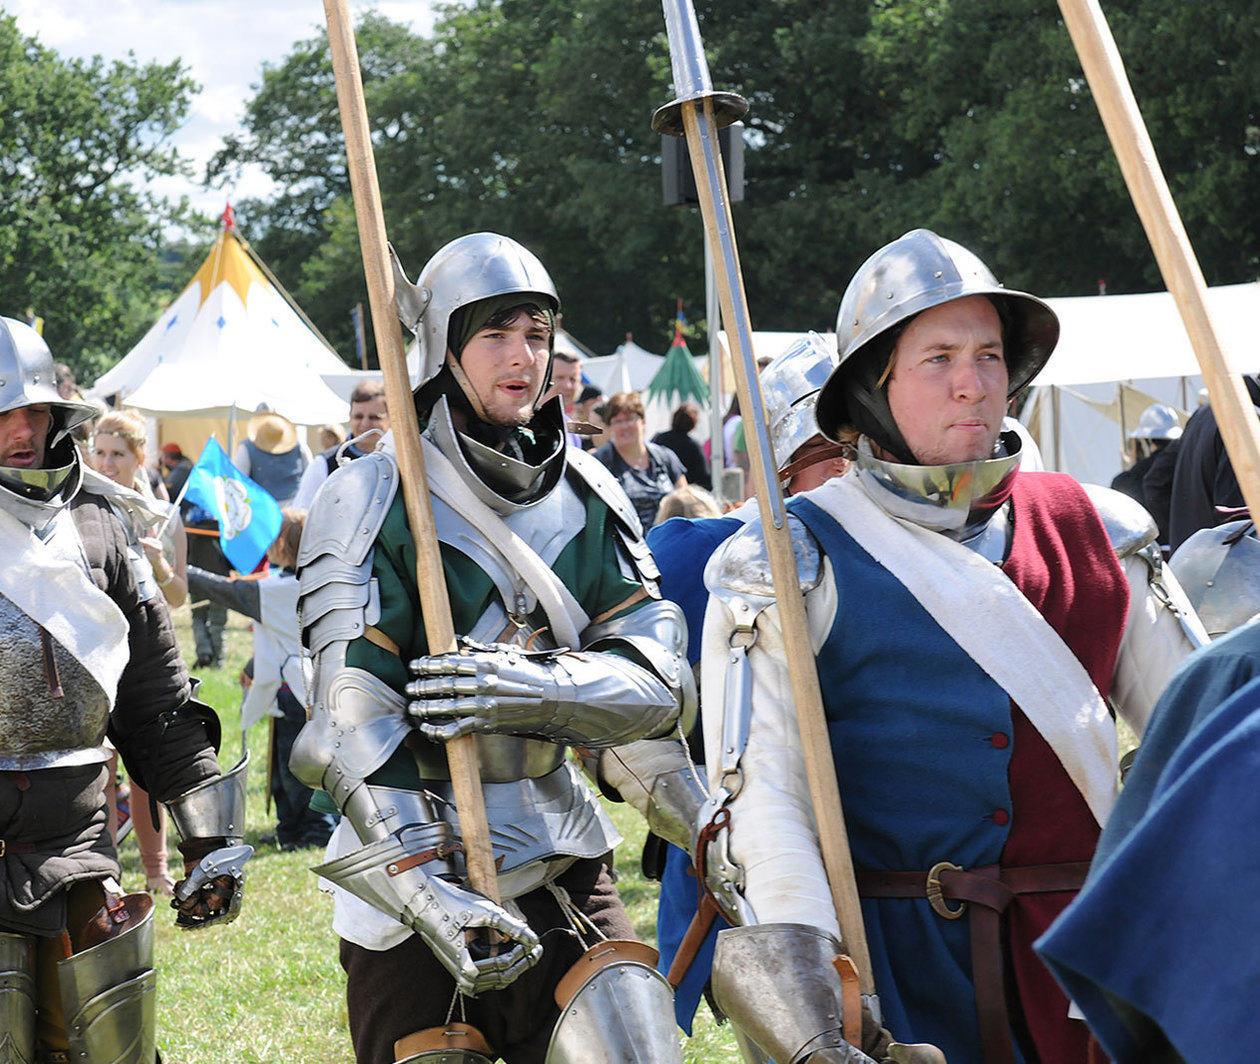 England in the Time of King Richard III